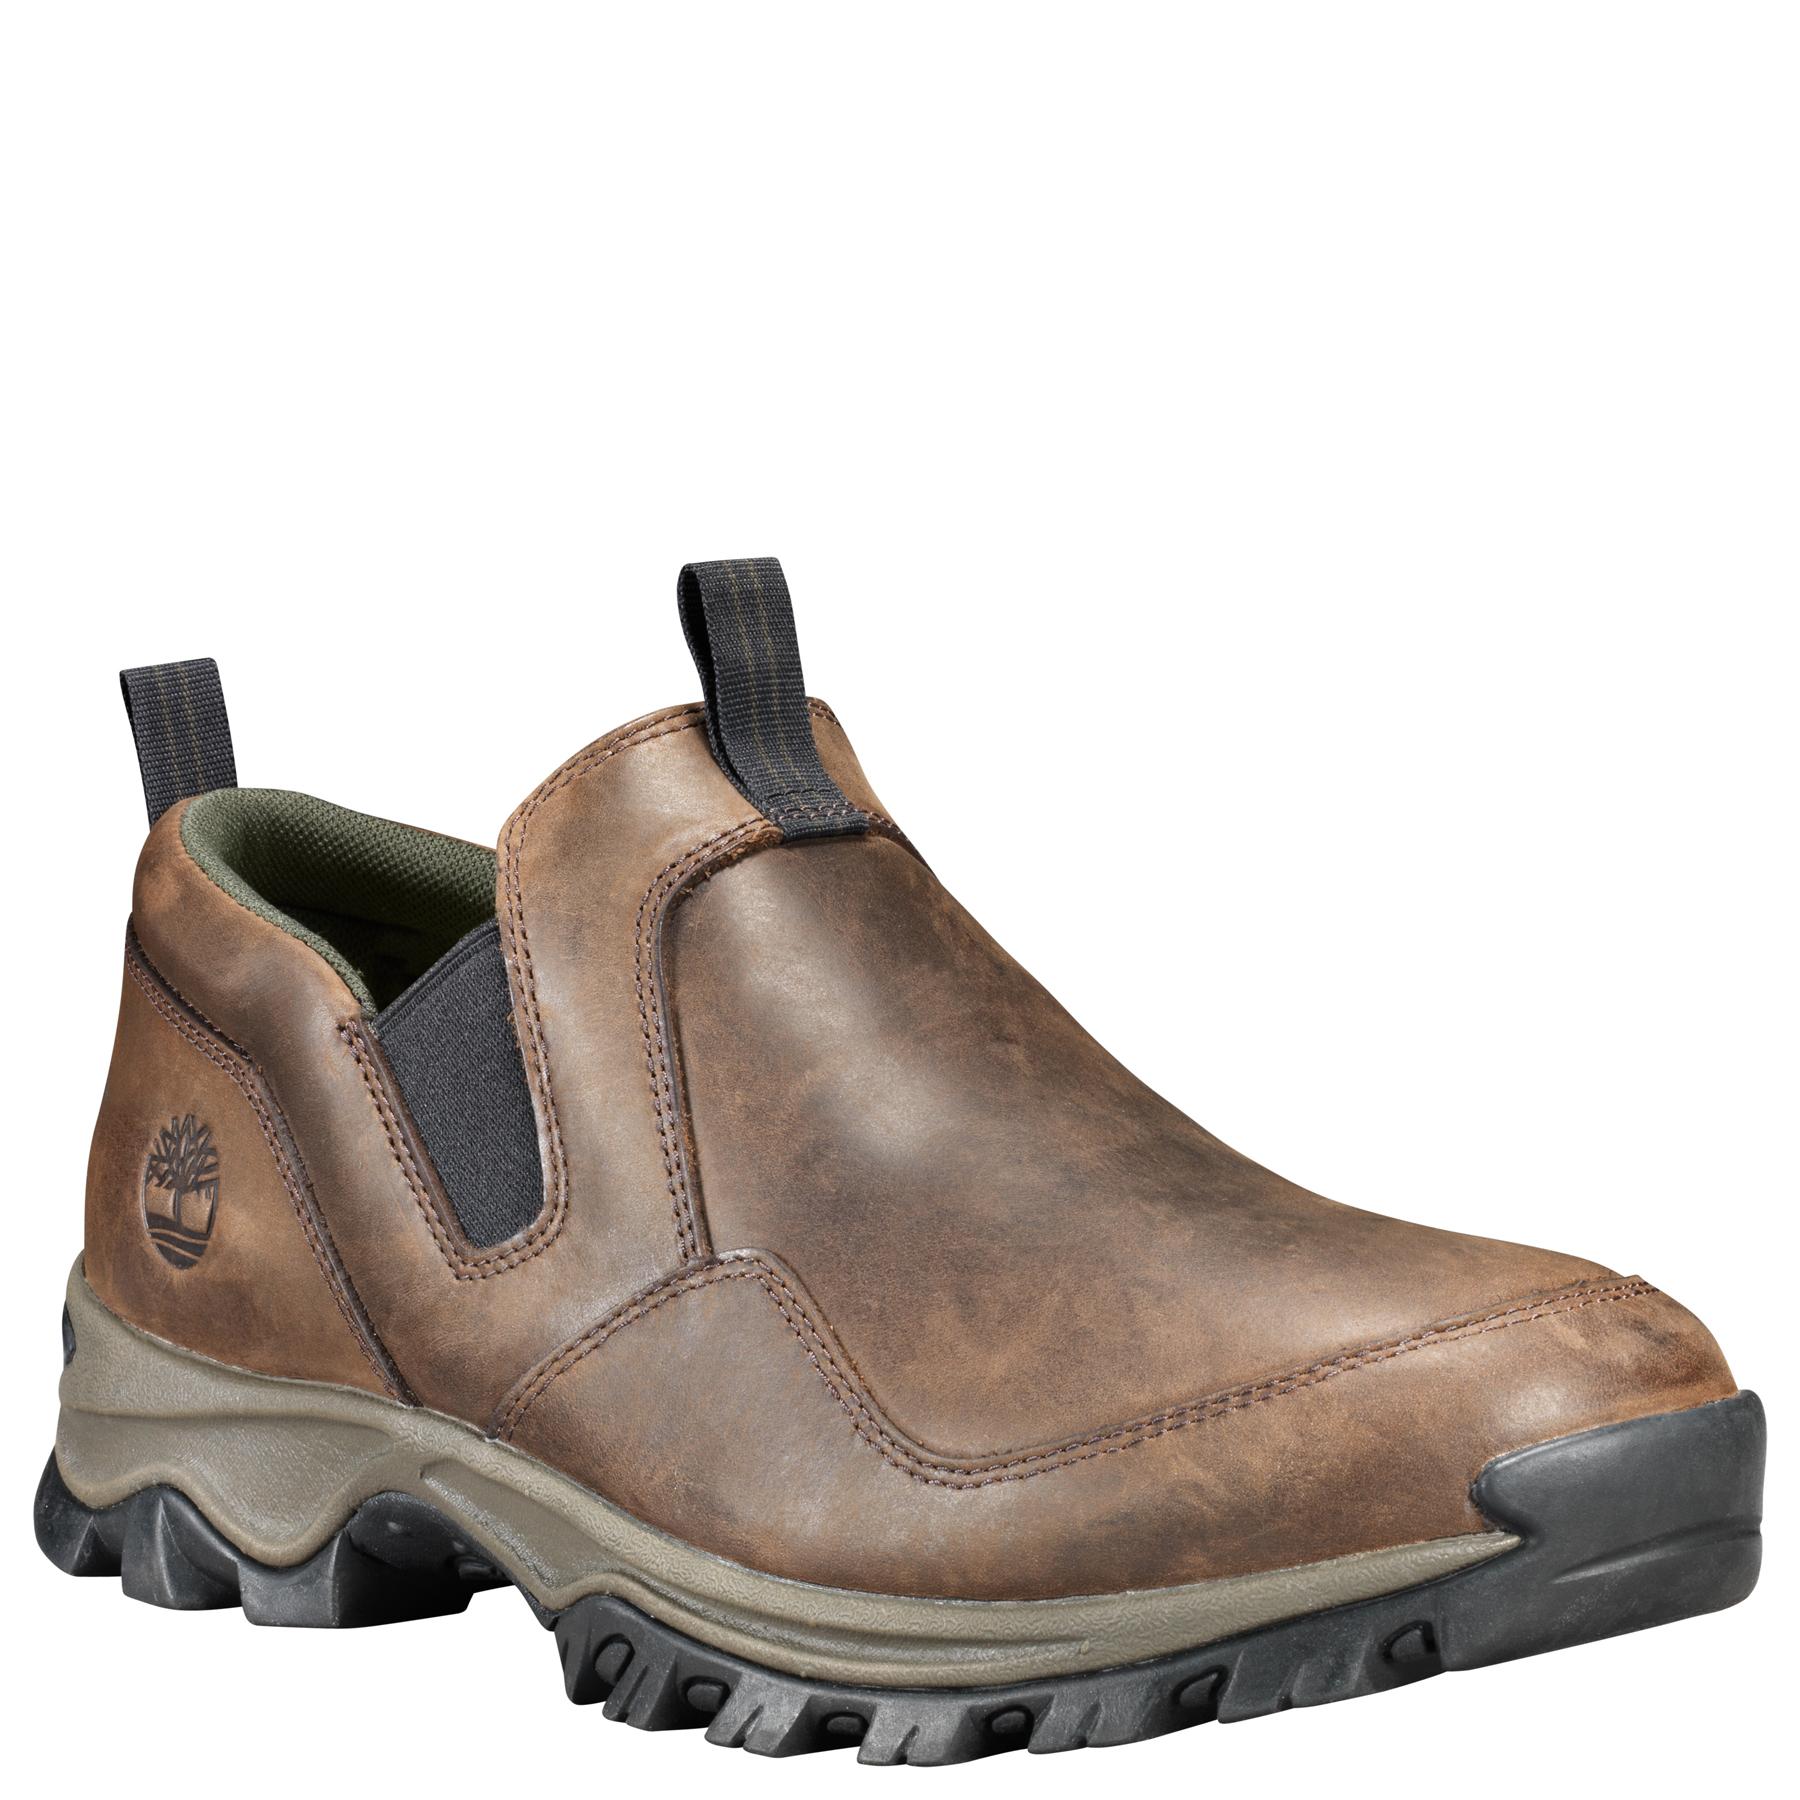 Timberland Mt. Maddsen Slip On Shoes Men's